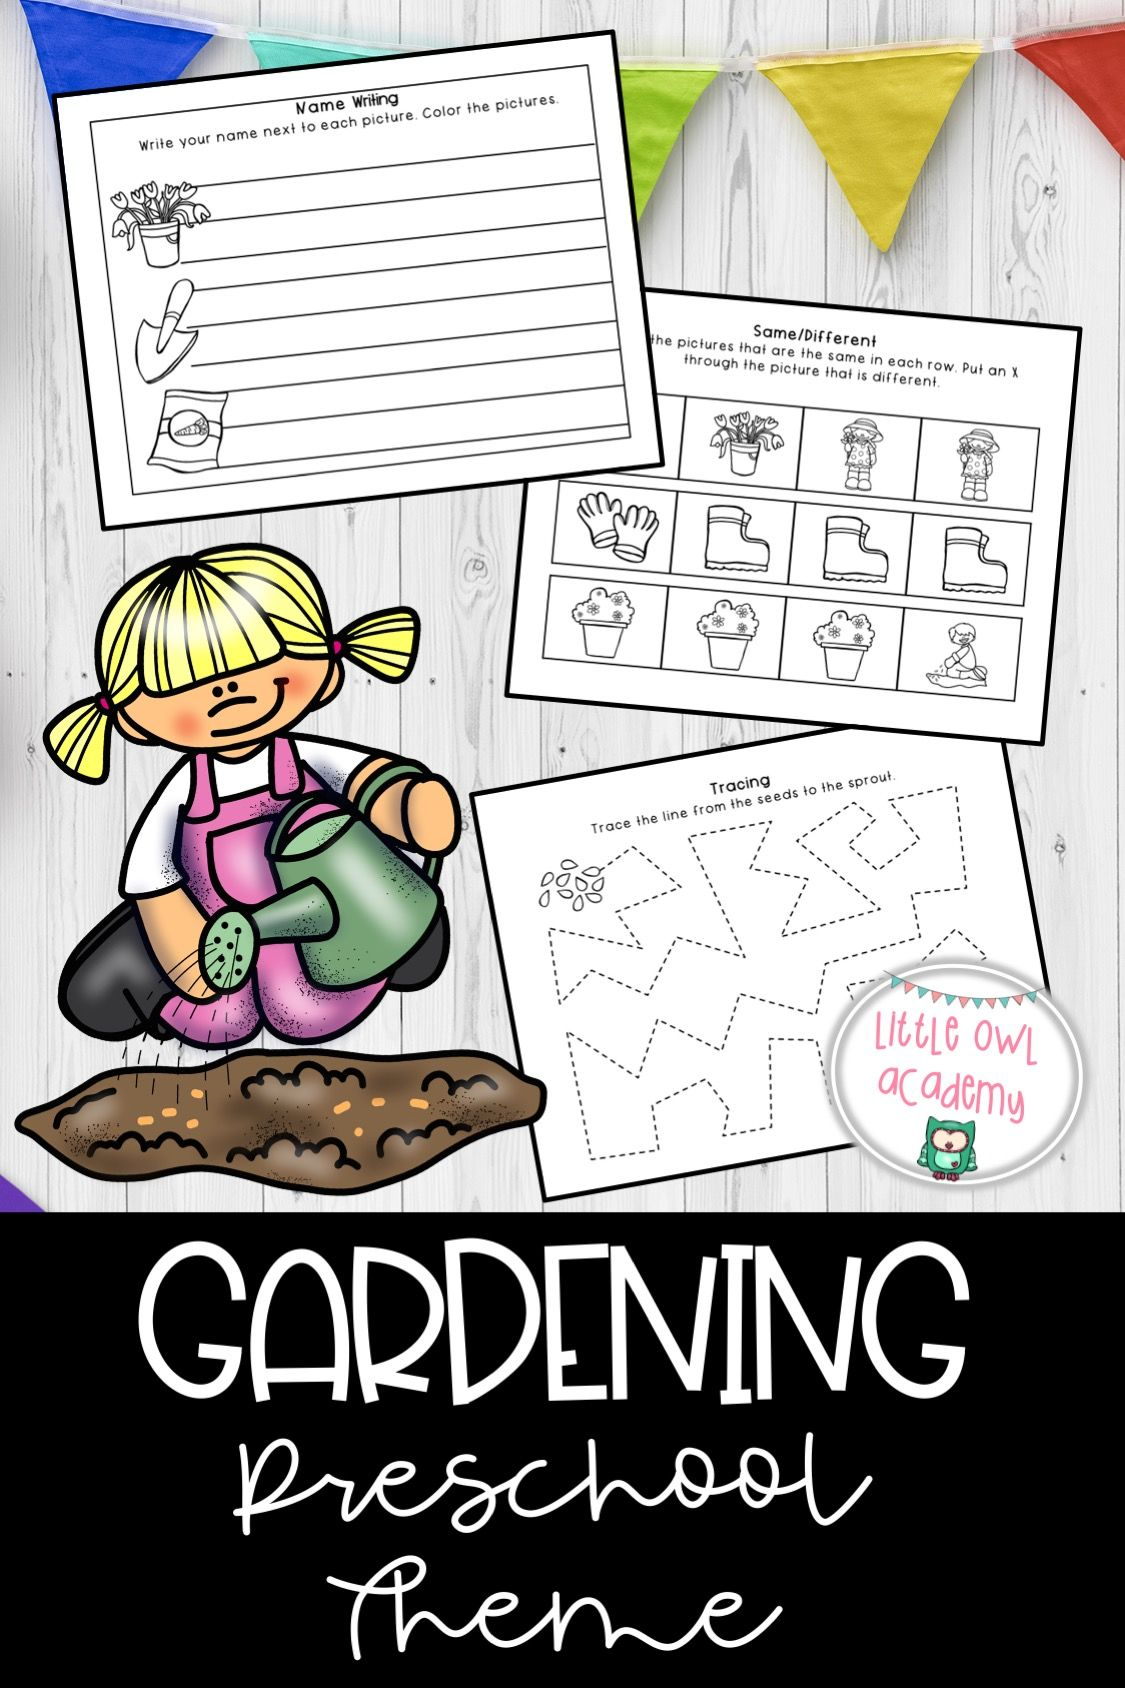 Gardening Preschool Theme In